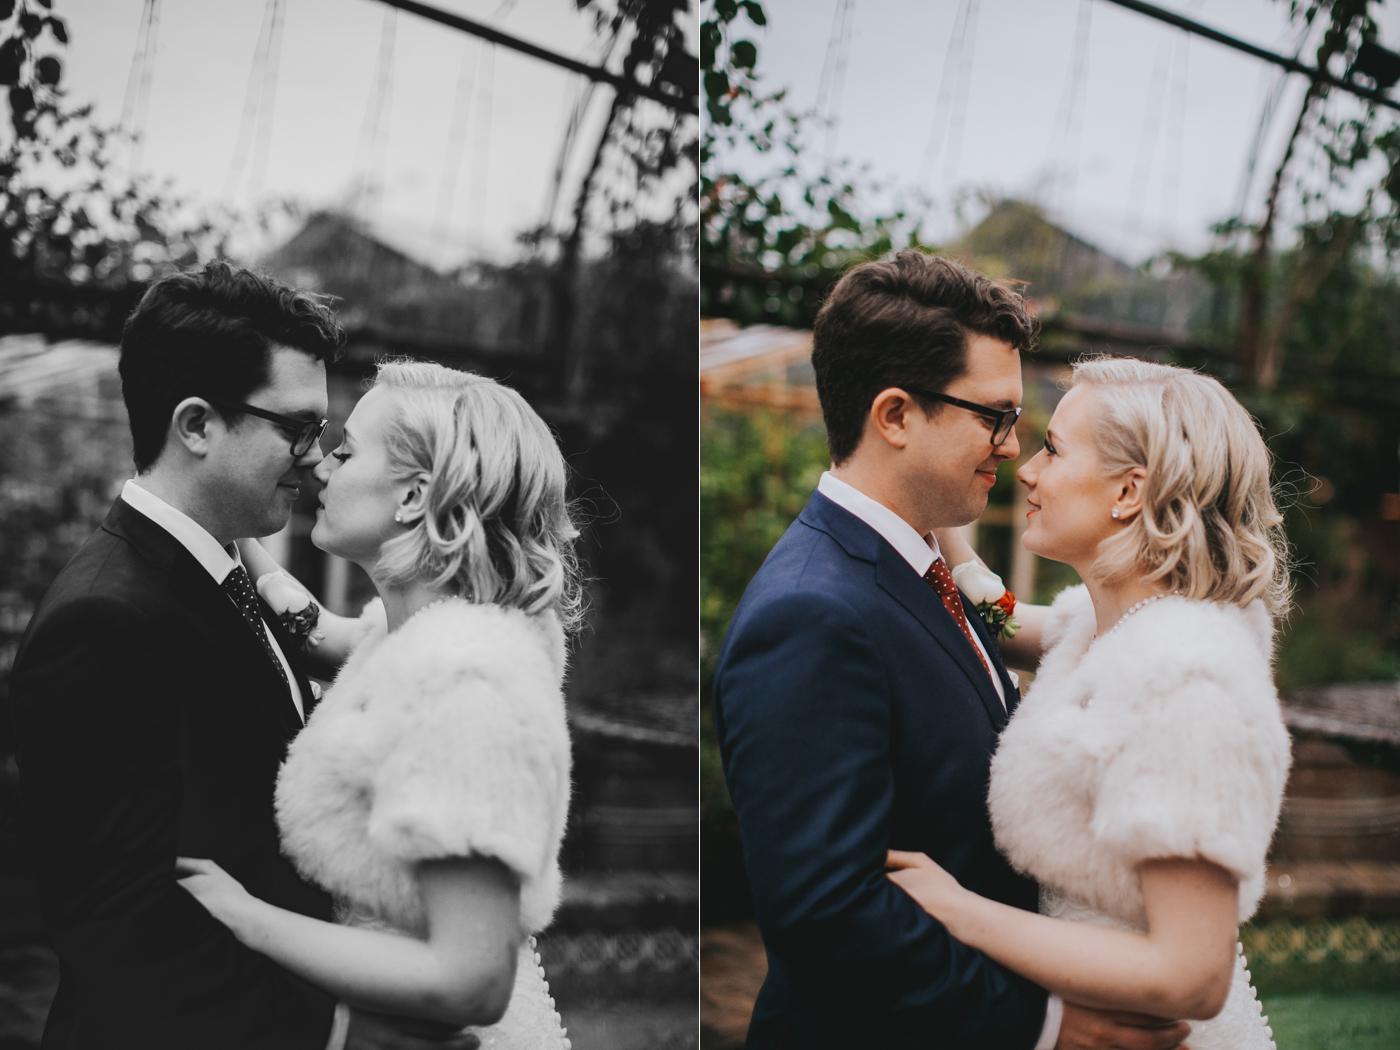 Jo & Tom Wedding - The Grounds of Alexandria - Samantha Heather Photography-223.jpg